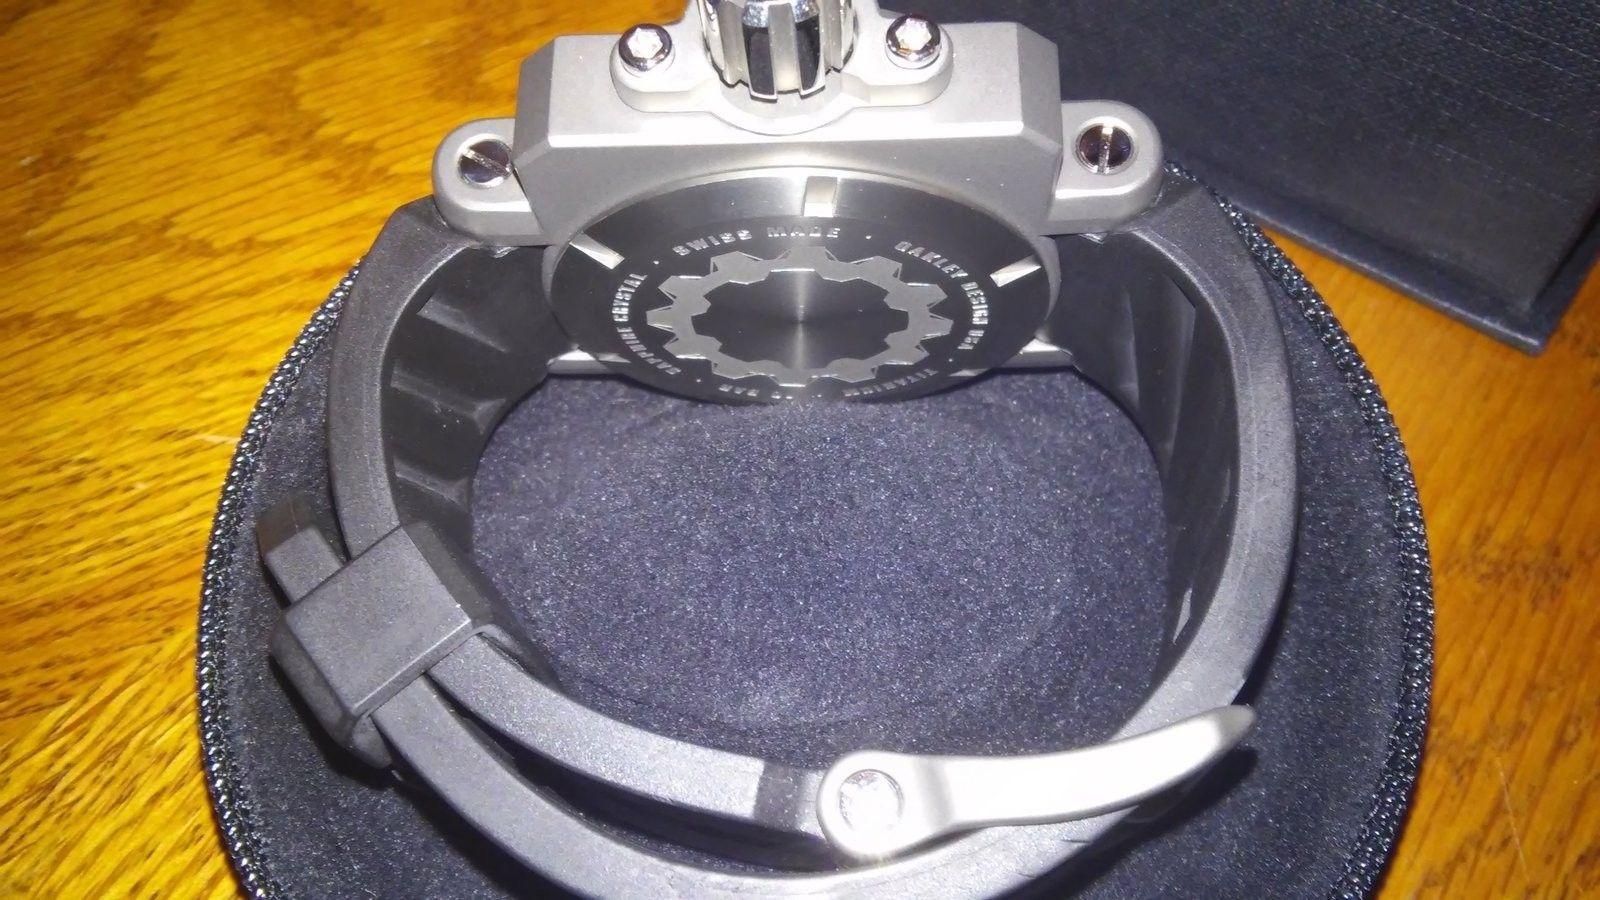 Gearbox ti/carbon fiber - 20150406_091149.jpg